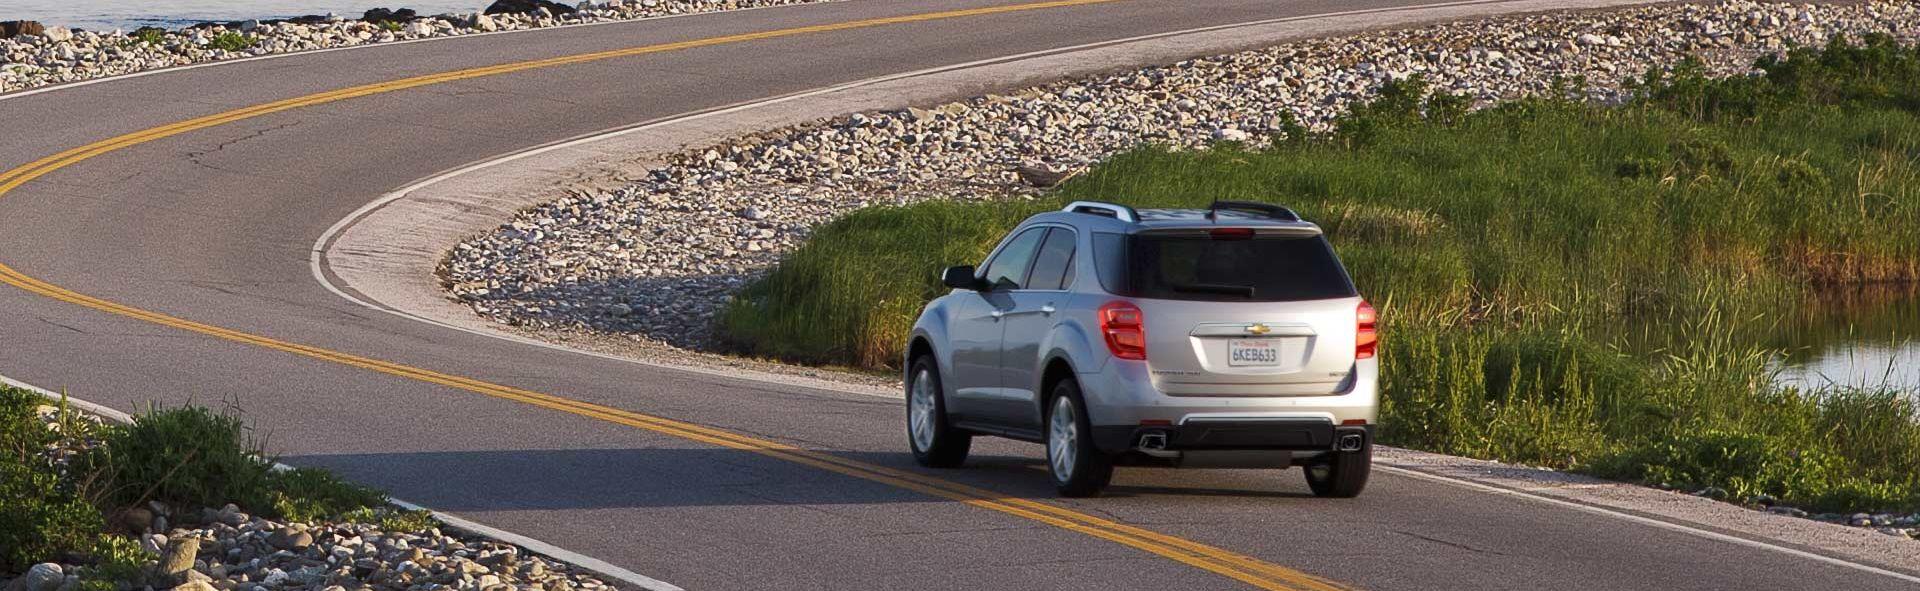 Used Chevrolet Equinox for Sale near Ann Arbor, MI